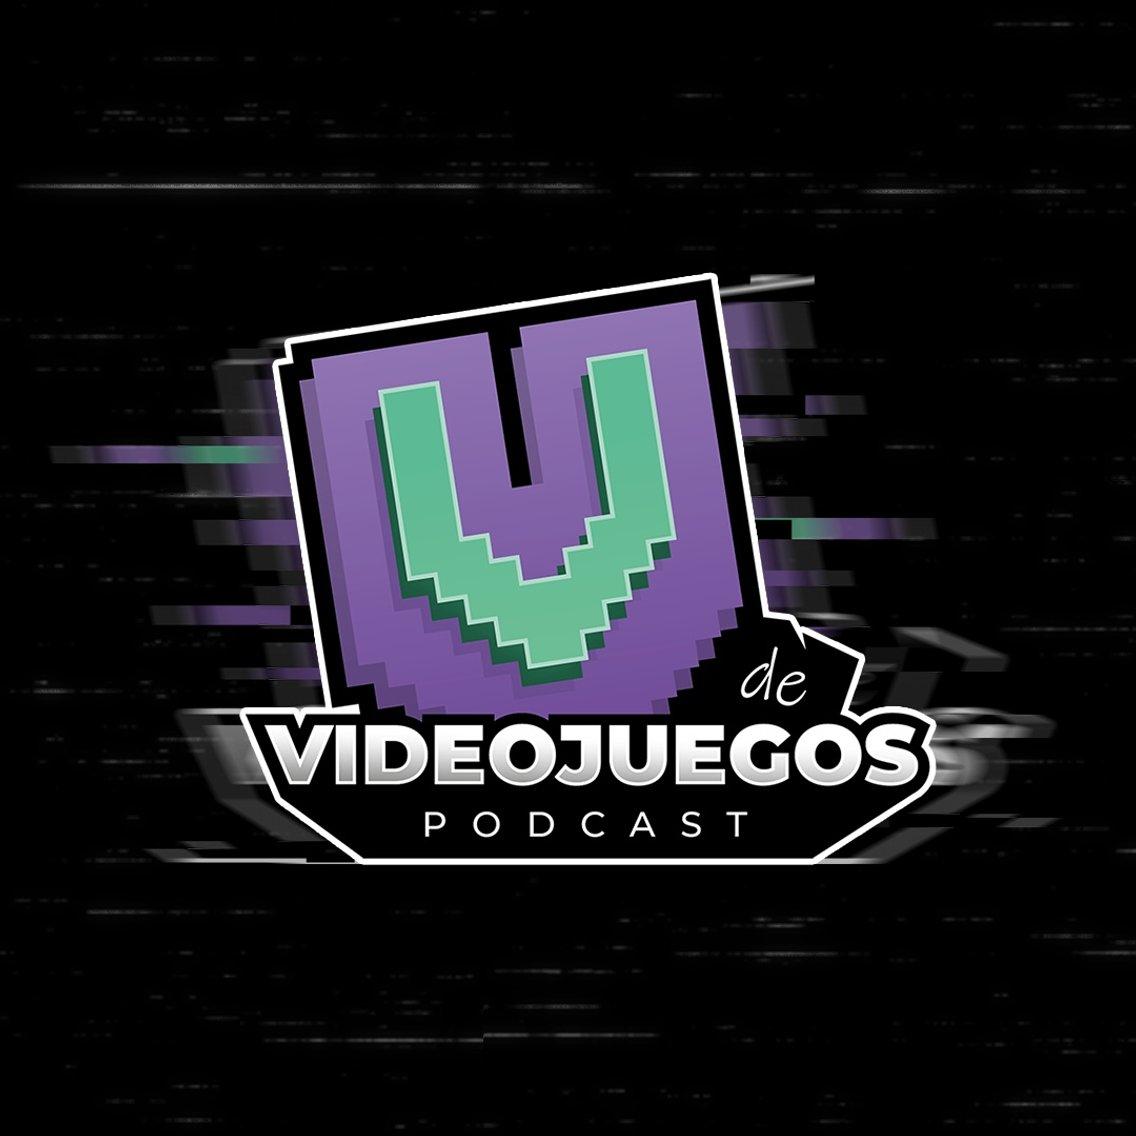 V de Videojuegos - imagen de portada